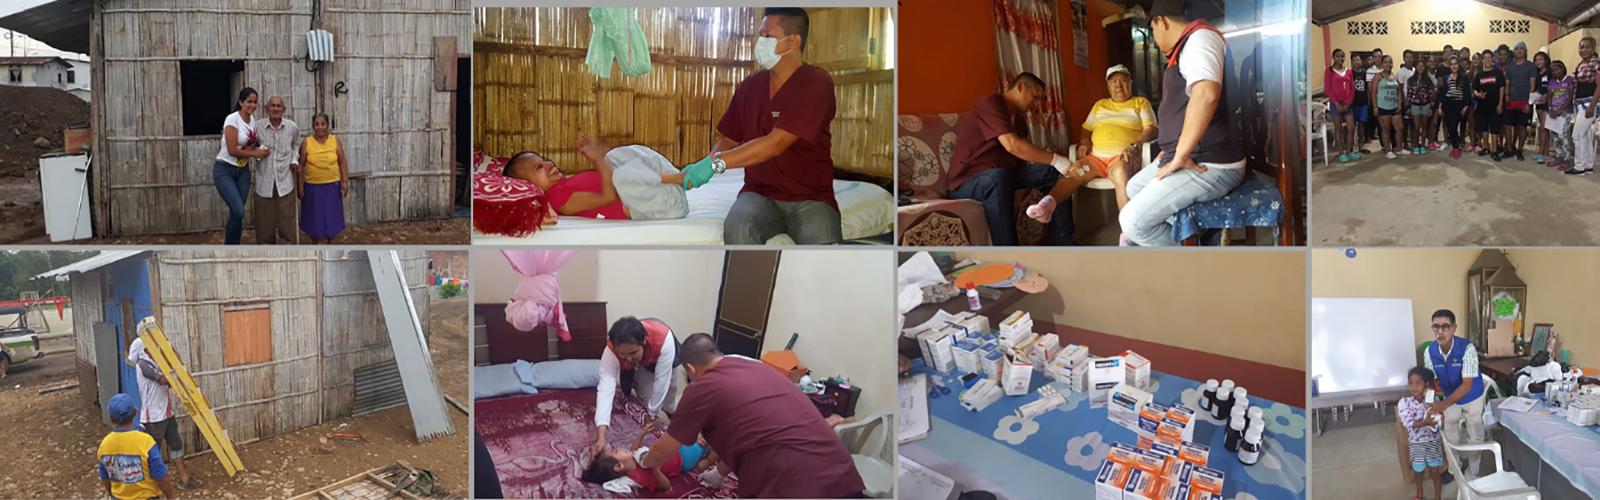 vacunacion.png